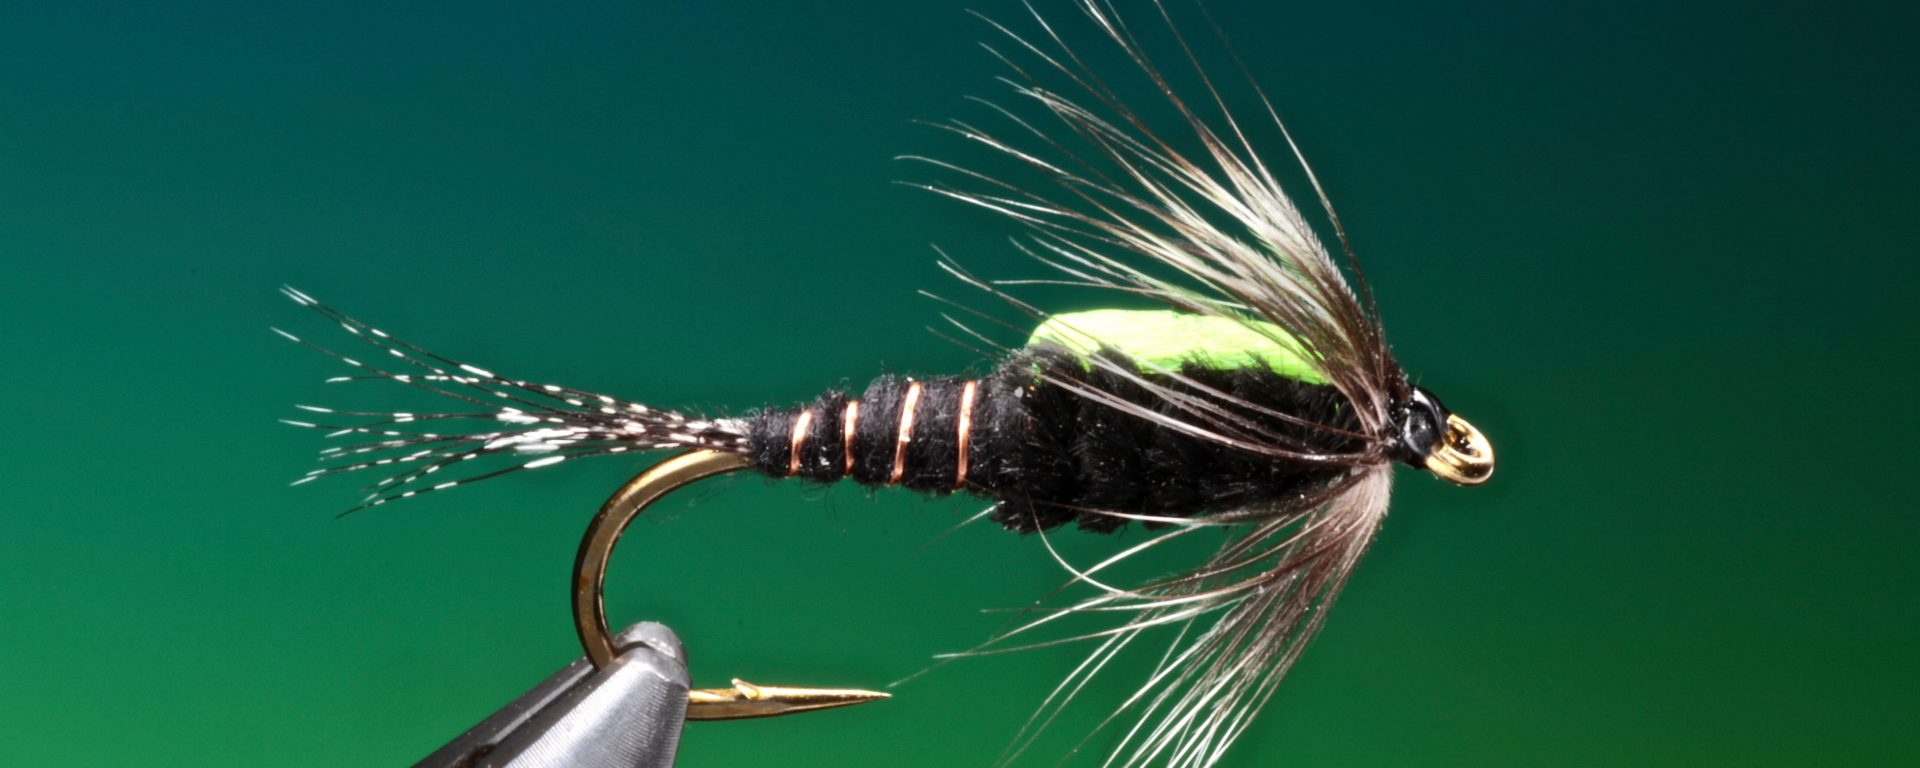 fly tying Black Martinez nymph